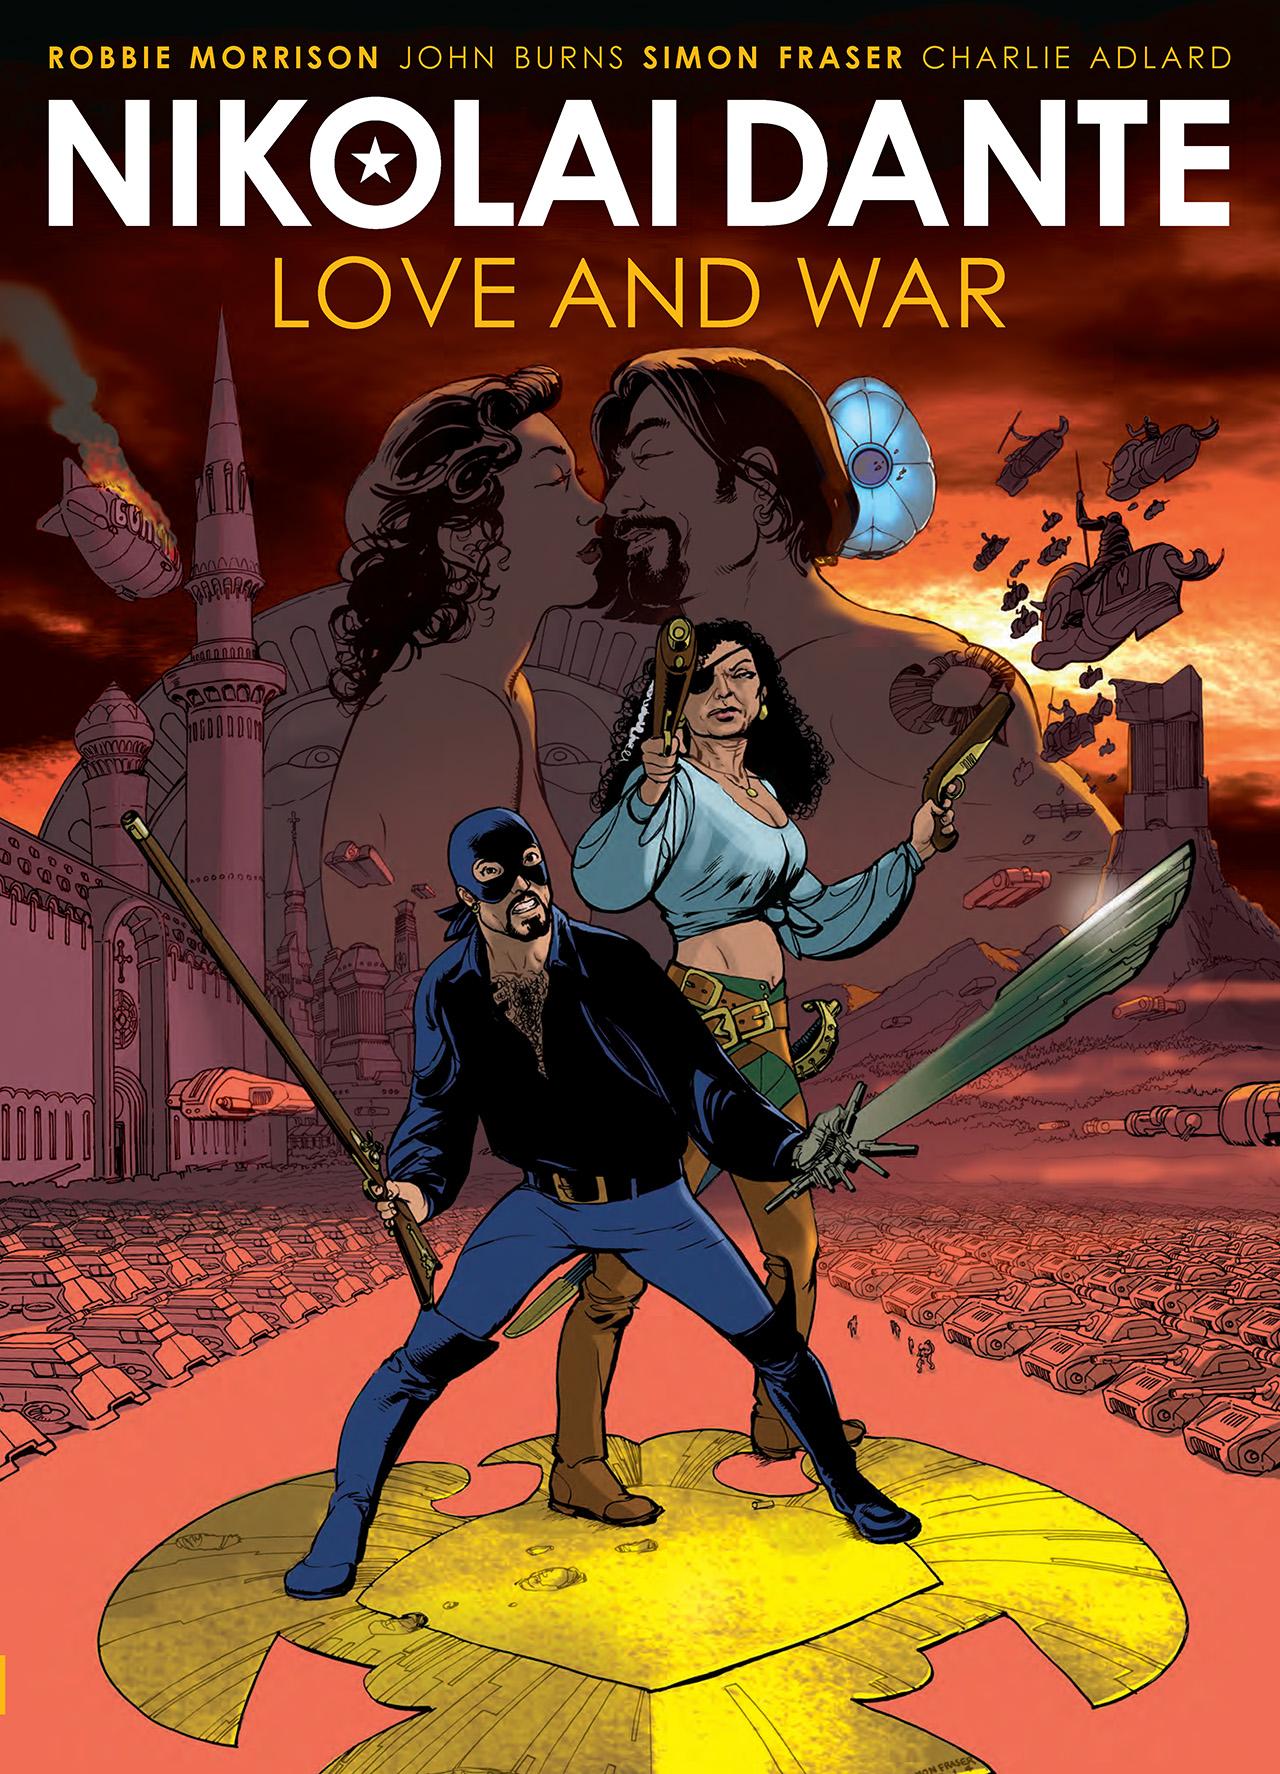 Read online Nikolai Dante comic -  Issue # TPB 3 - 1